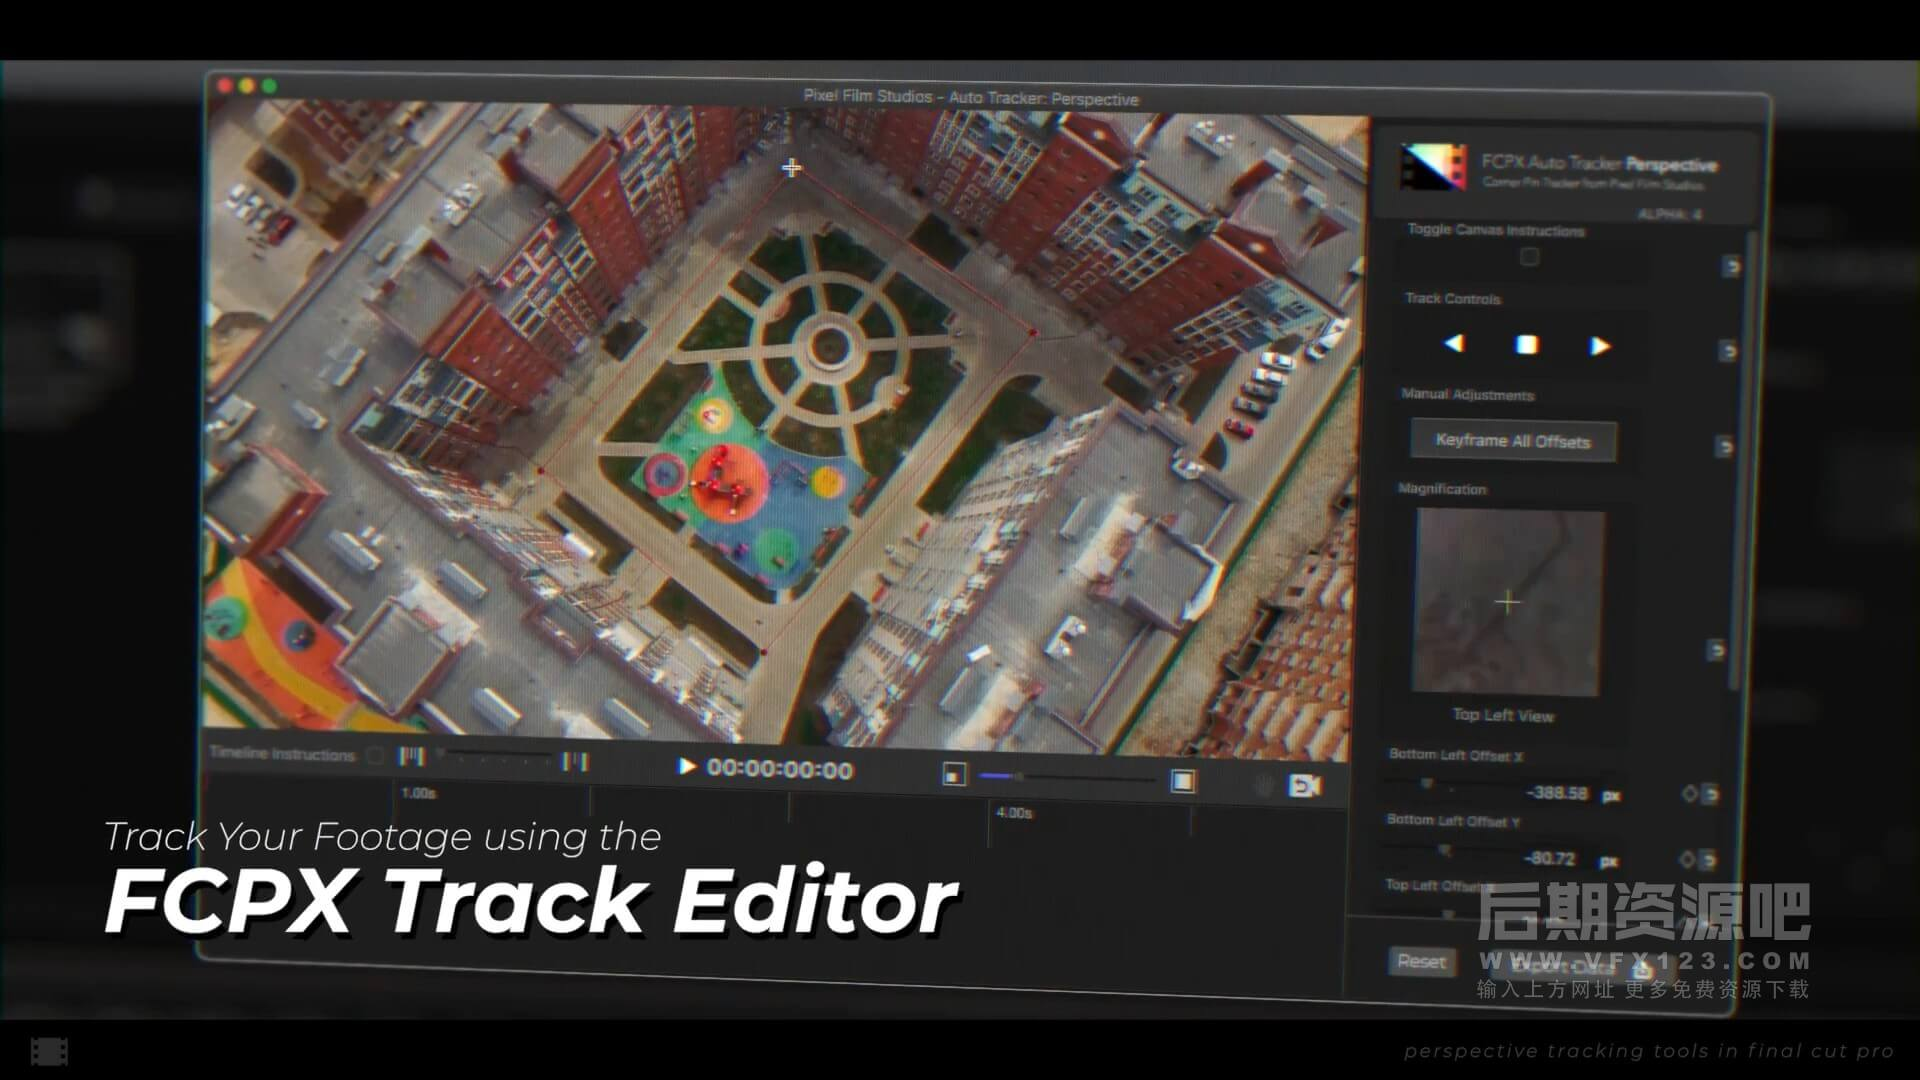 fcpx特效插件 四点平面自动跟踪透视特效 Auto Tracker Perspective 2.1